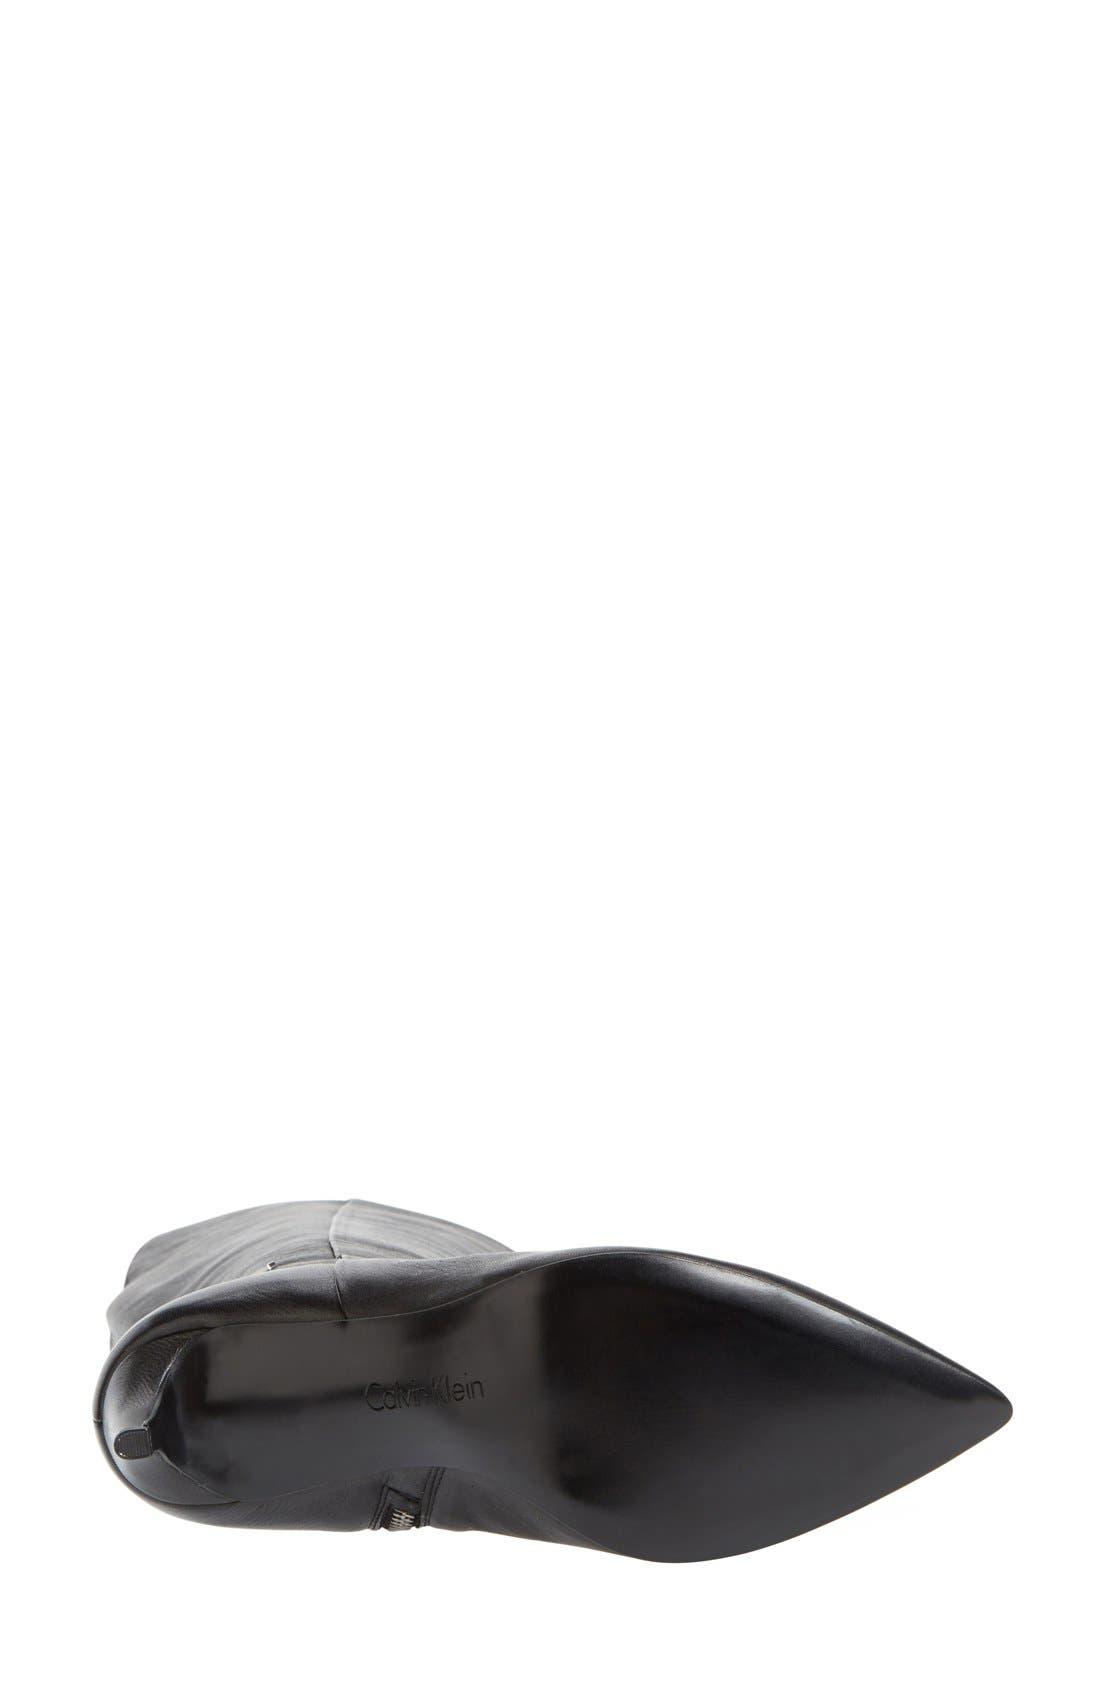 Alternate Image 4  - Calvin Klein 'Clancey' Over the Knee Boot (Women)